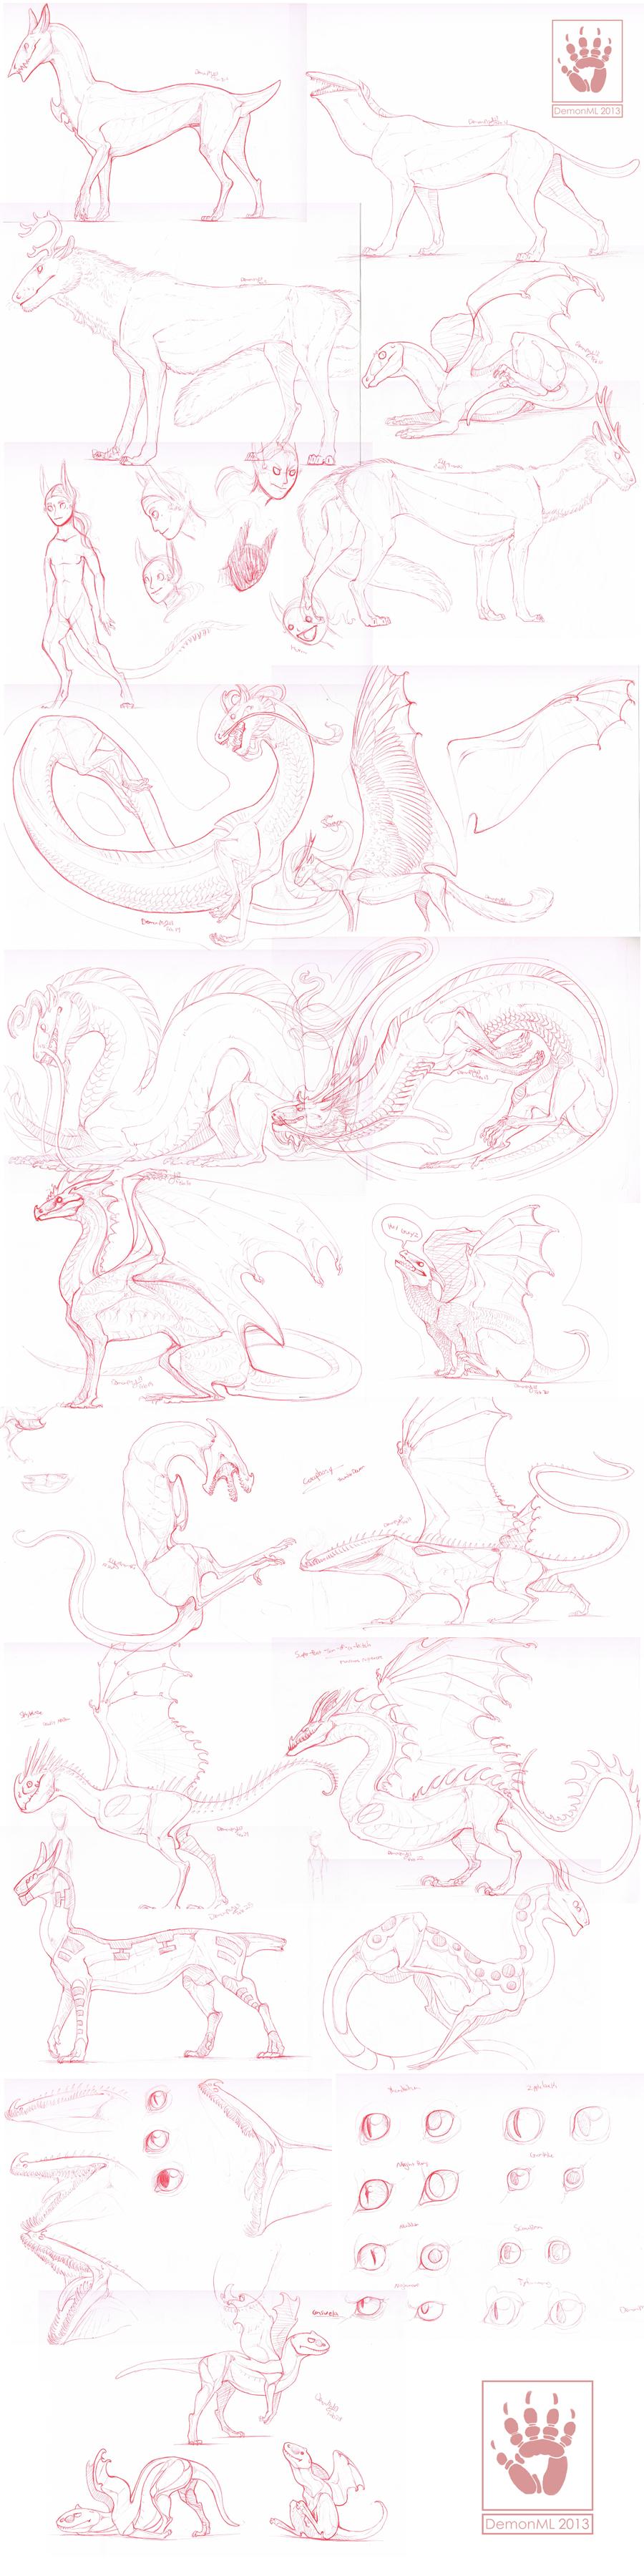 Sketch Dump by DemonML